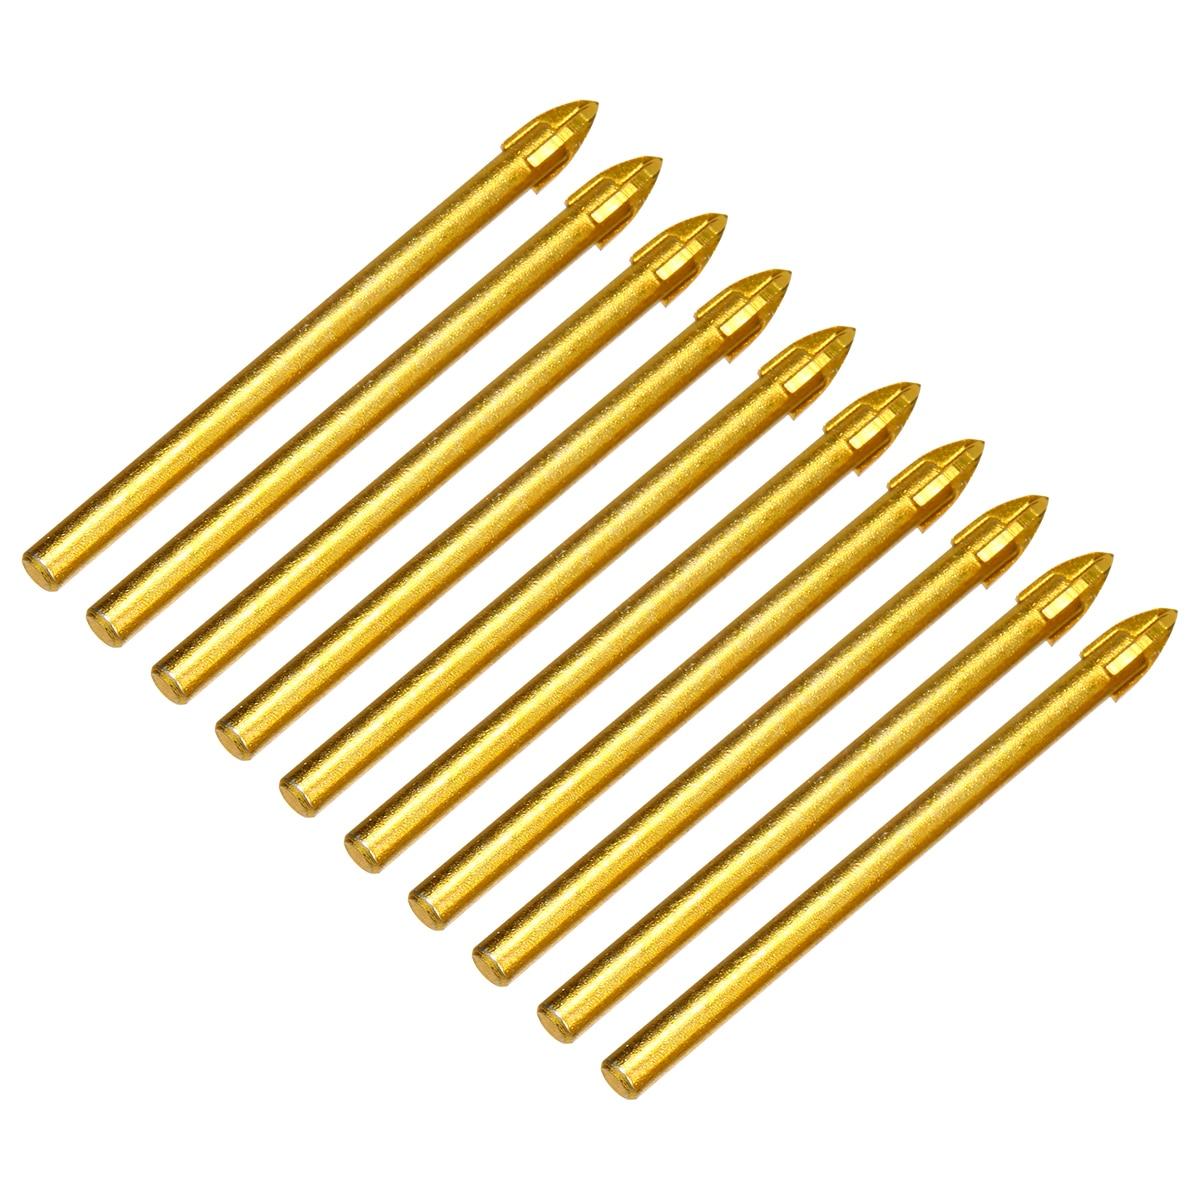 10pcs Titanium Ceramic Glass Drill Bit Tungsten Carbide Cross Spear Head Drilling Tools 6mm For Metal Plastic Tile Cement